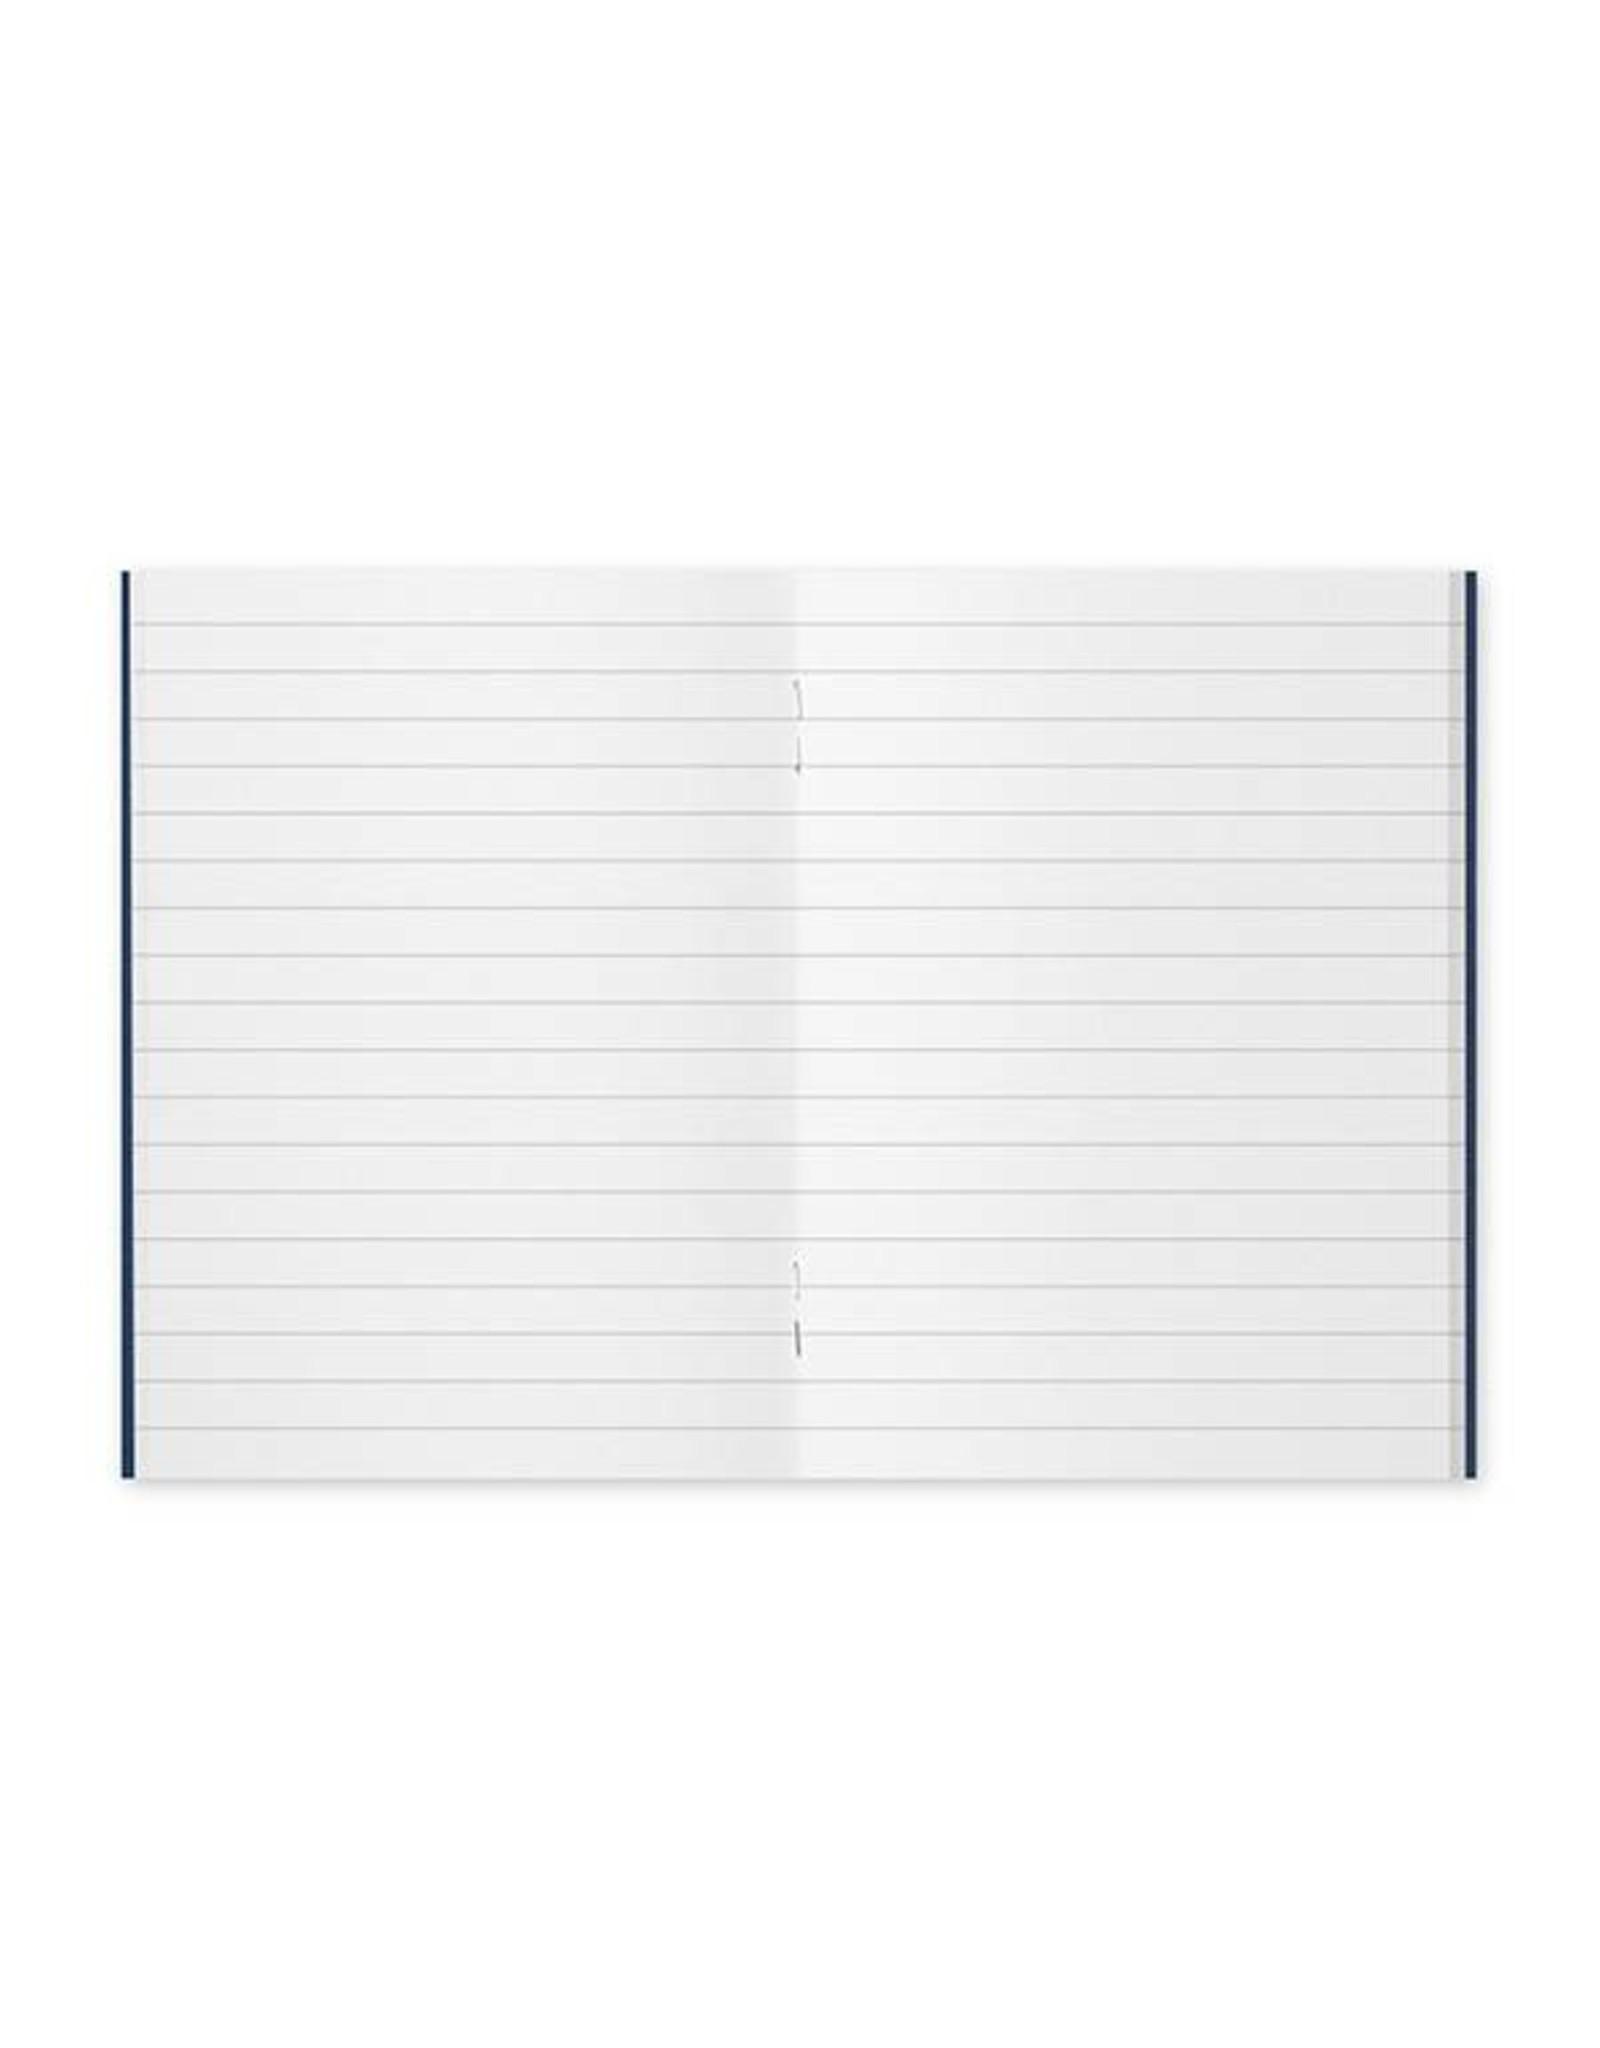 Traveler's Company 001. RULED LINE MIDORI TRAVELER'S NOTEBOOK PASSPORT SIZE